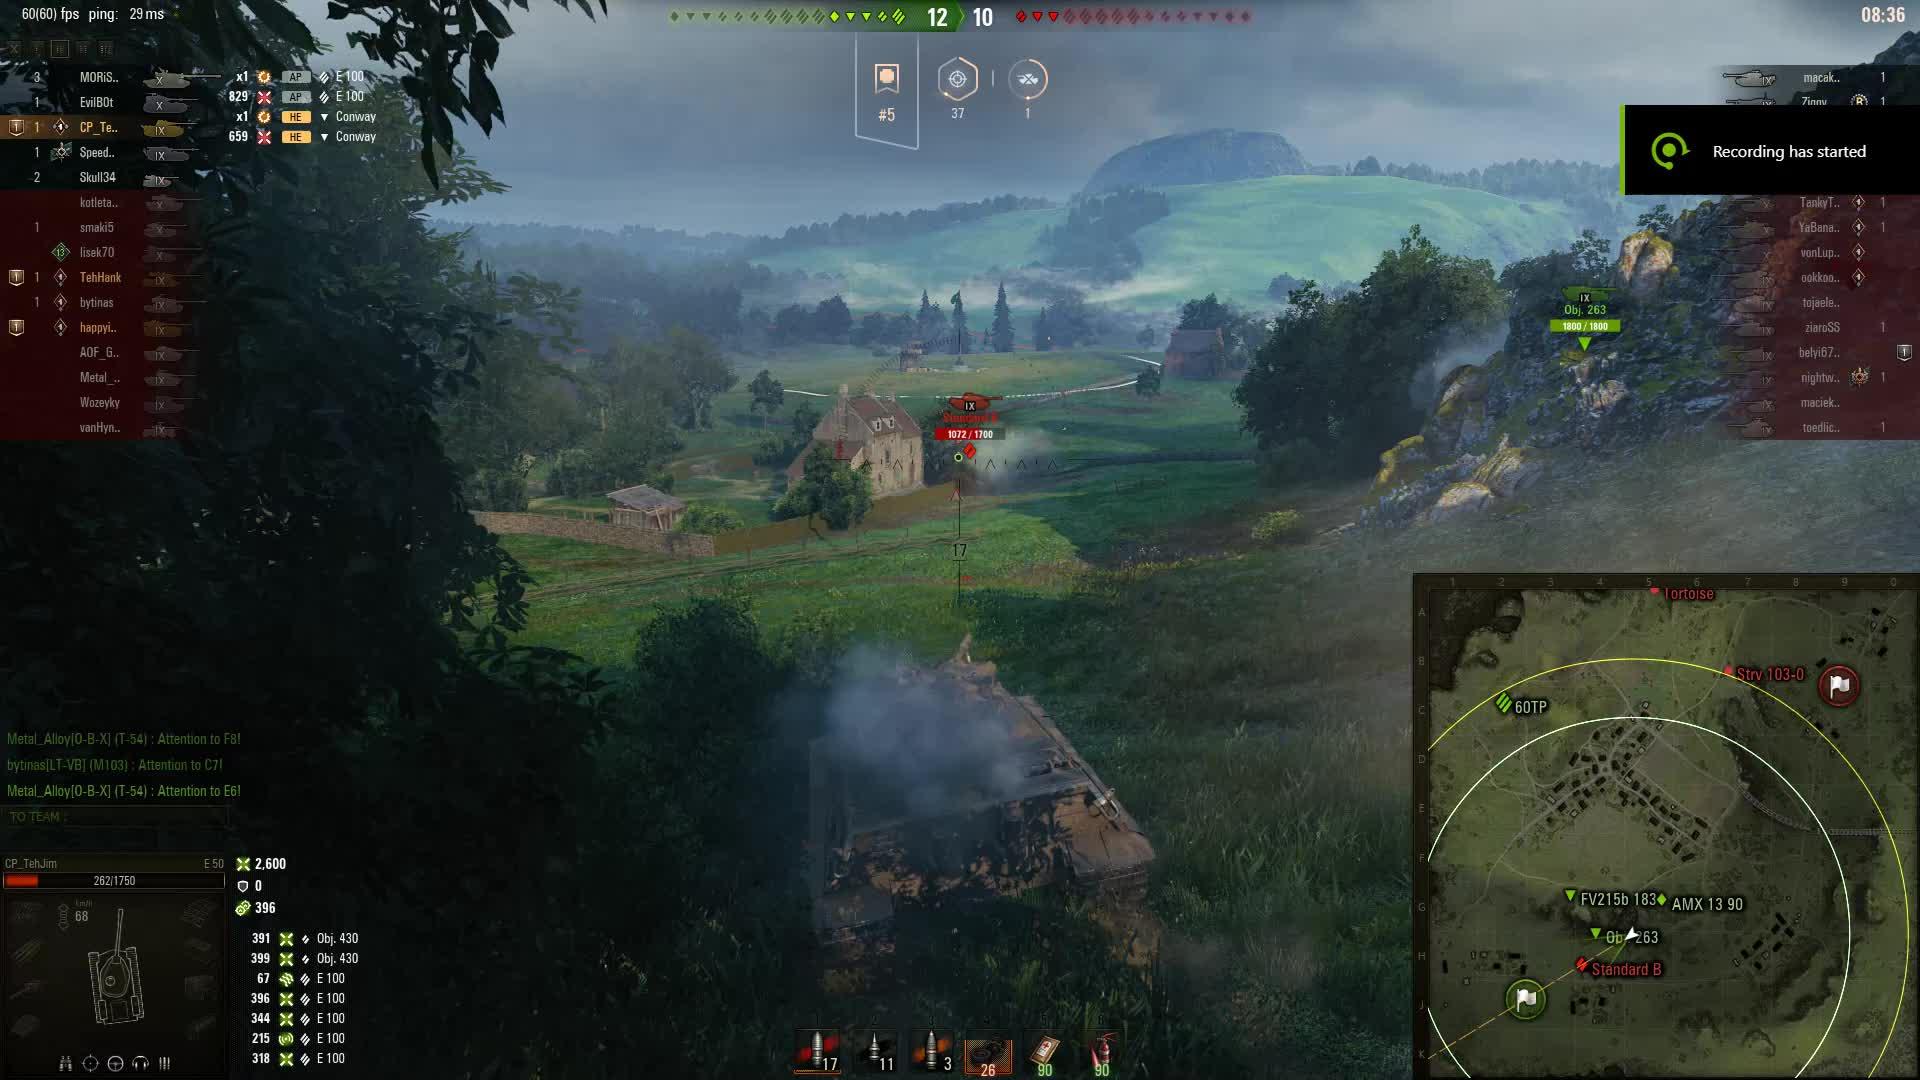 worldoftanks, World of Tanks 2019.02.17 - 01.09.28.01 GIFs